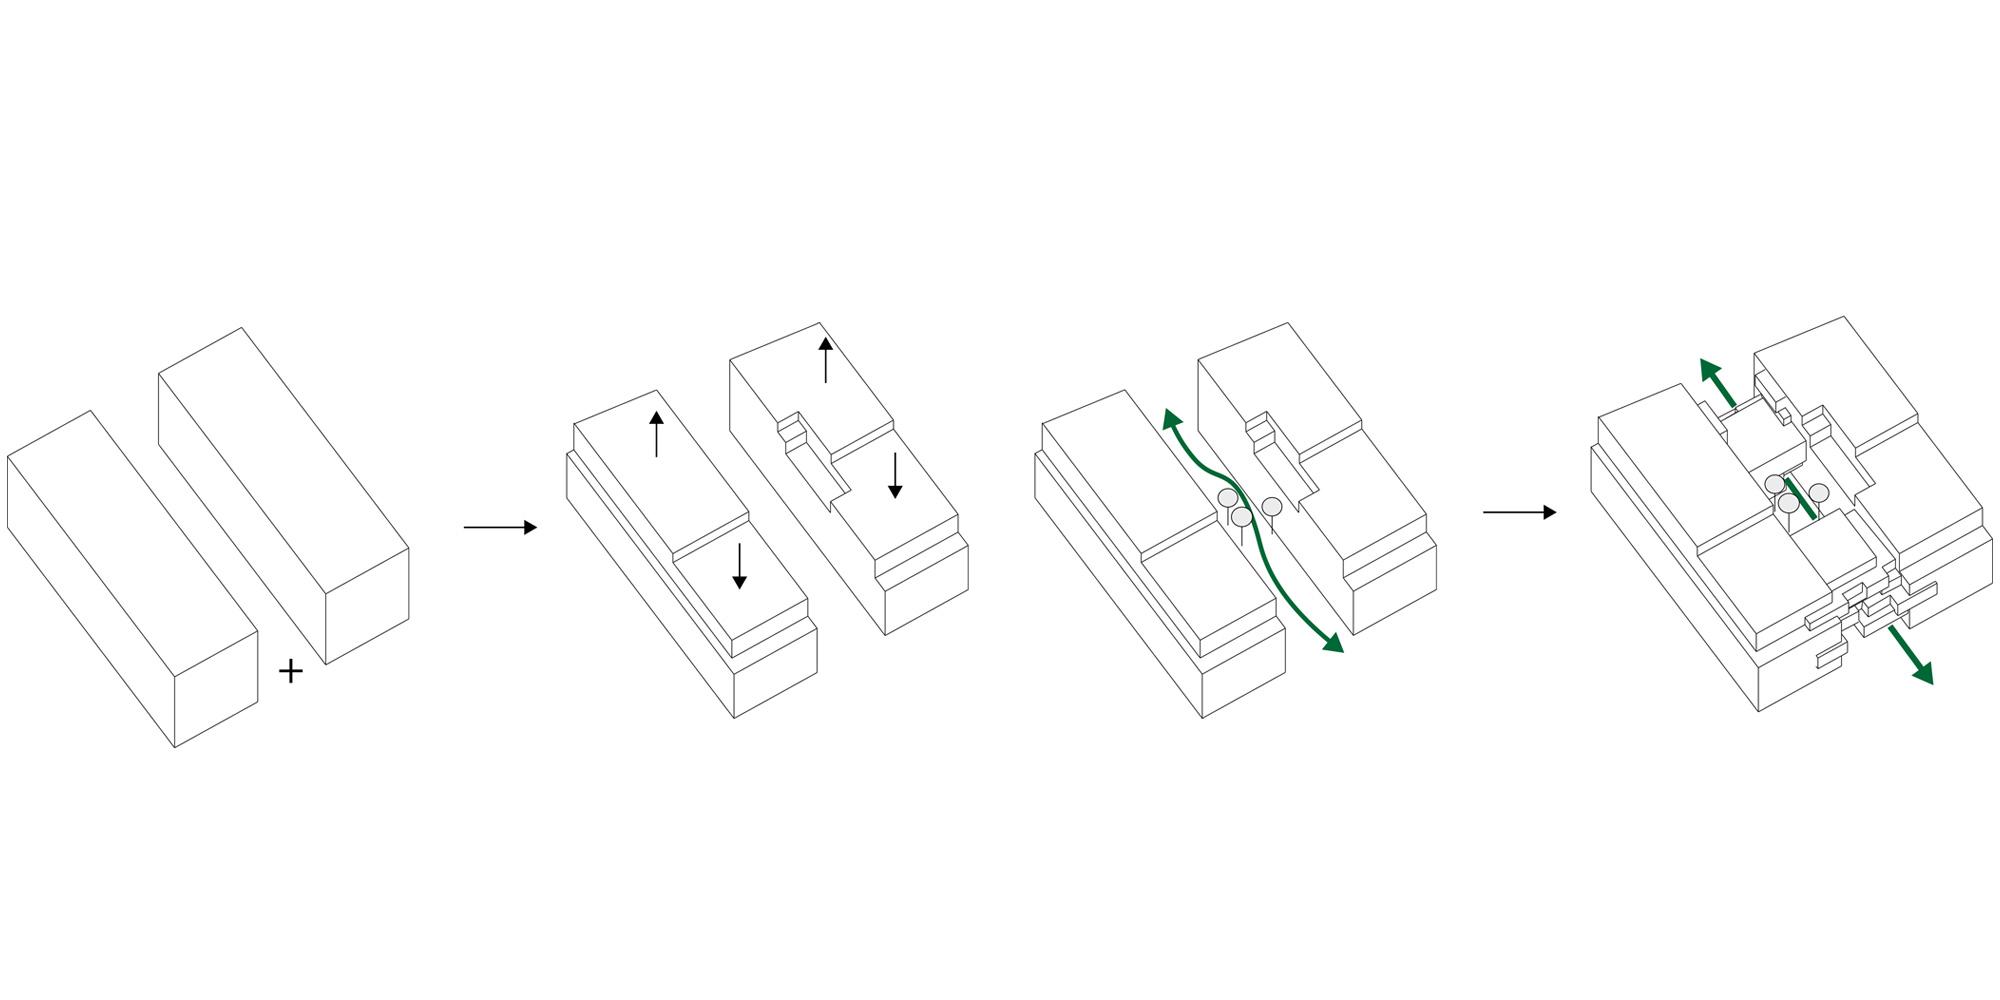 Diagrammi © PETITDIDIERPRIOUX Architectes